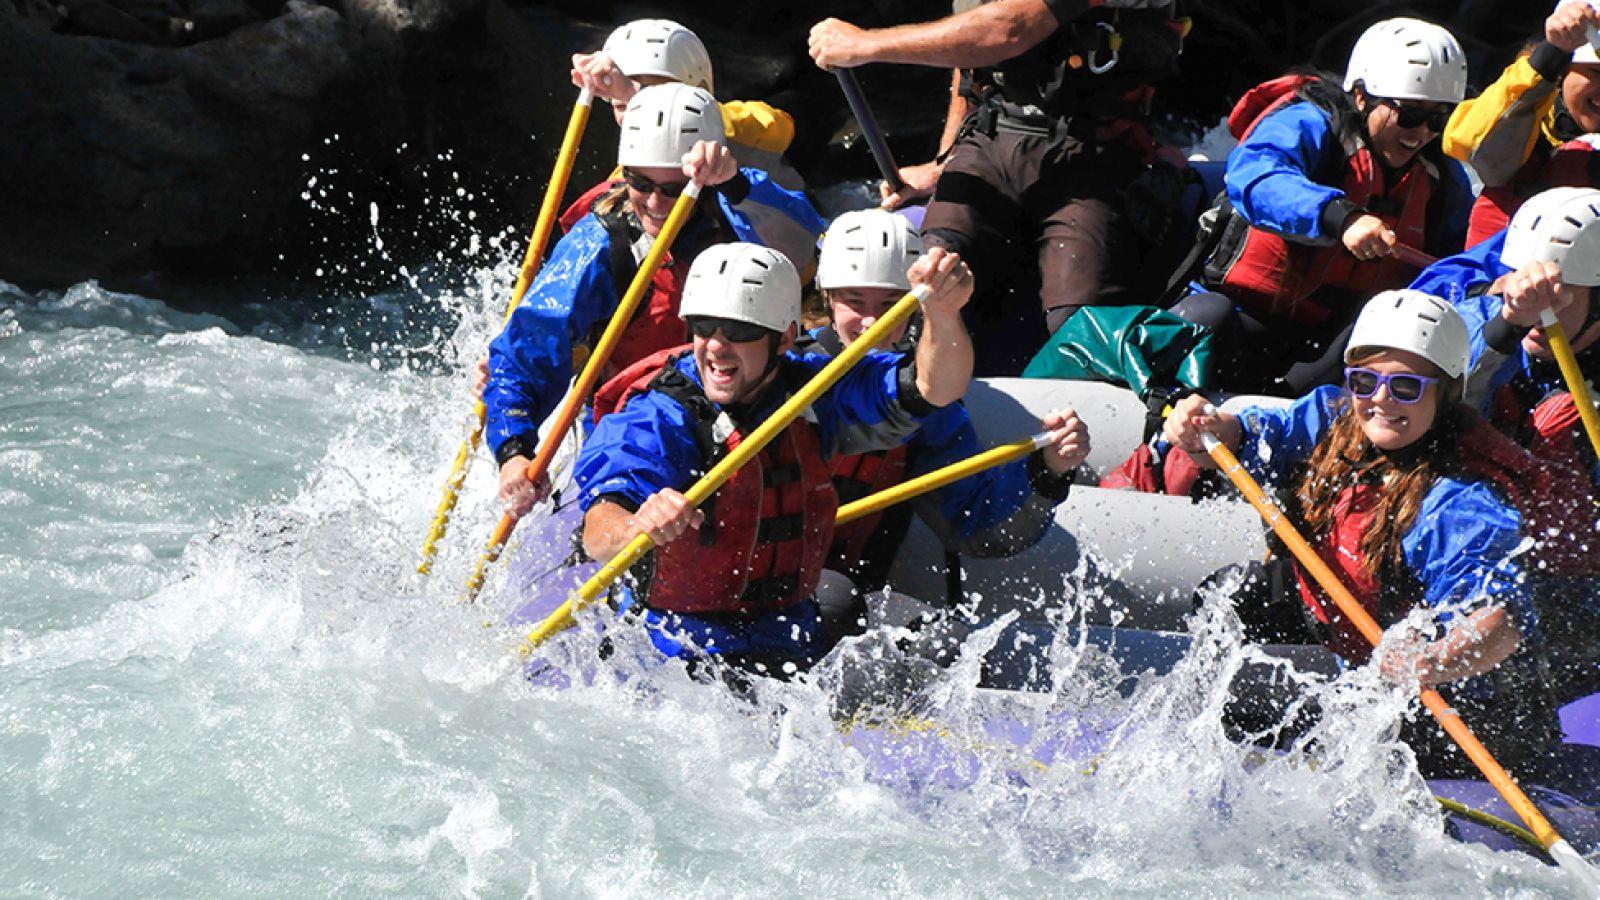 The fun and wild Illecillewaet River.